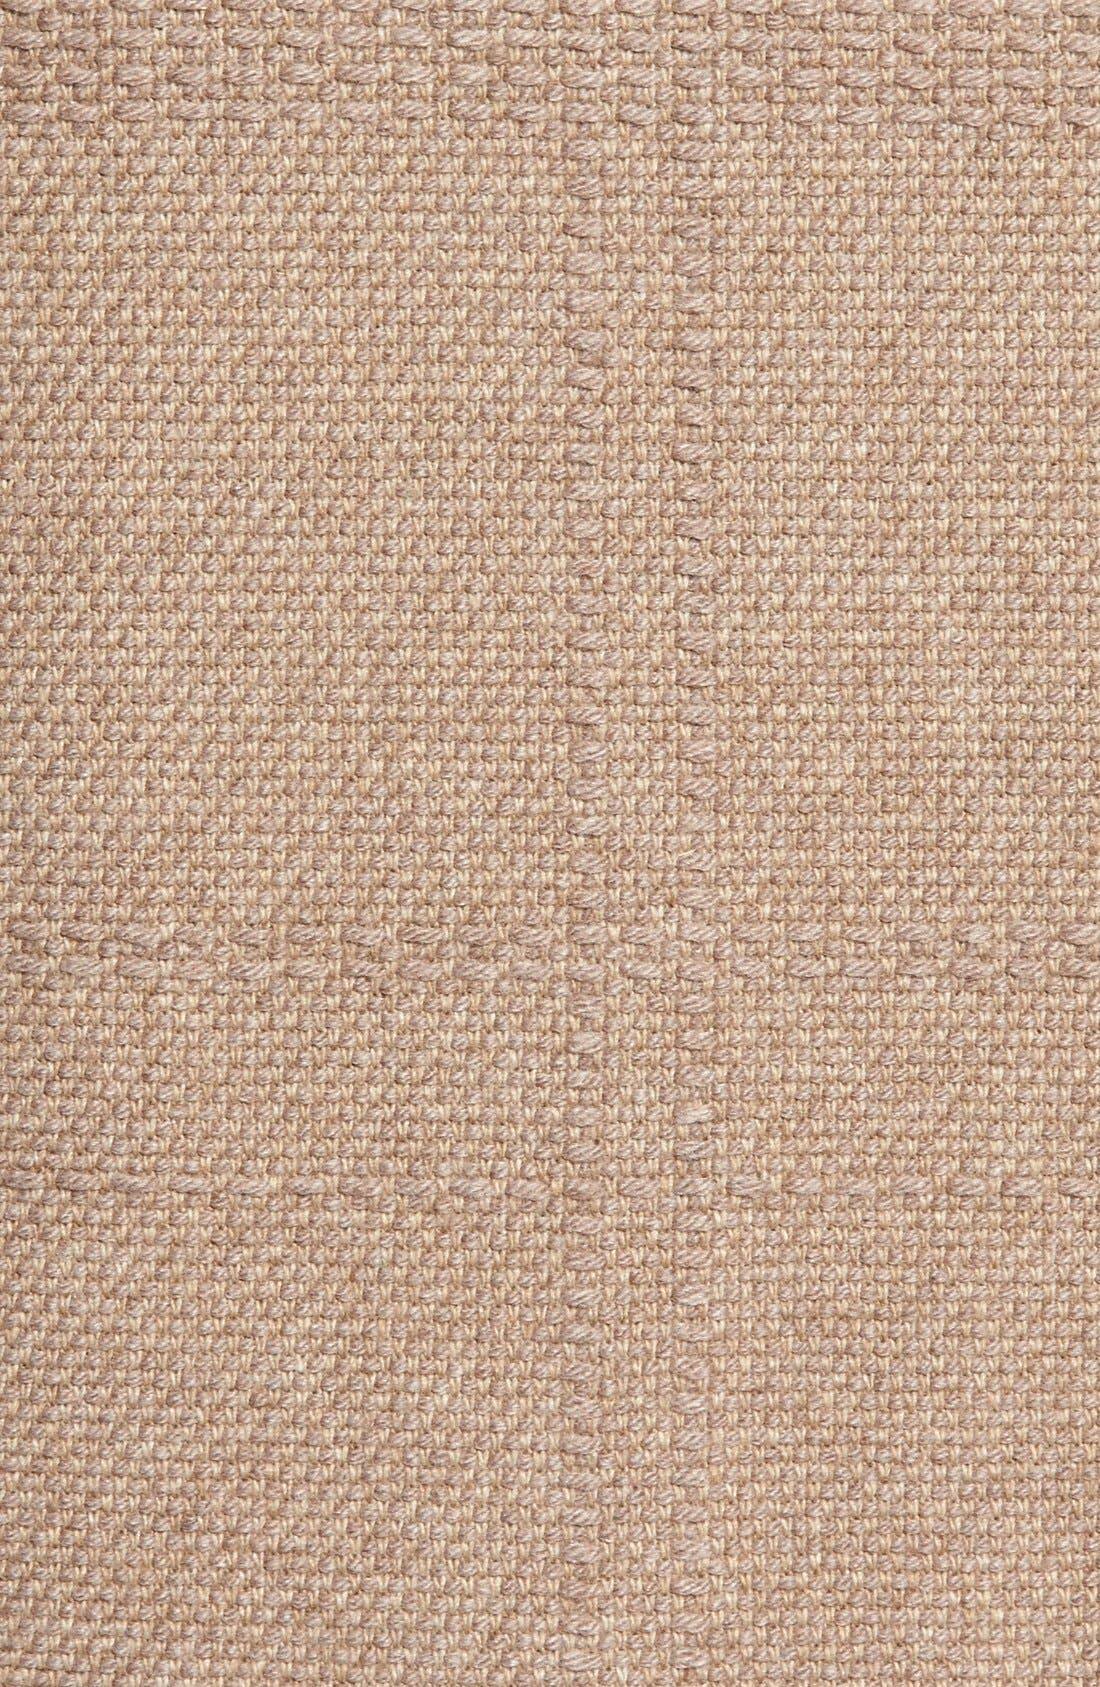 'Tiree' Multi Texture Cardigan,                             Alternate thumbnail 5, color,                             270